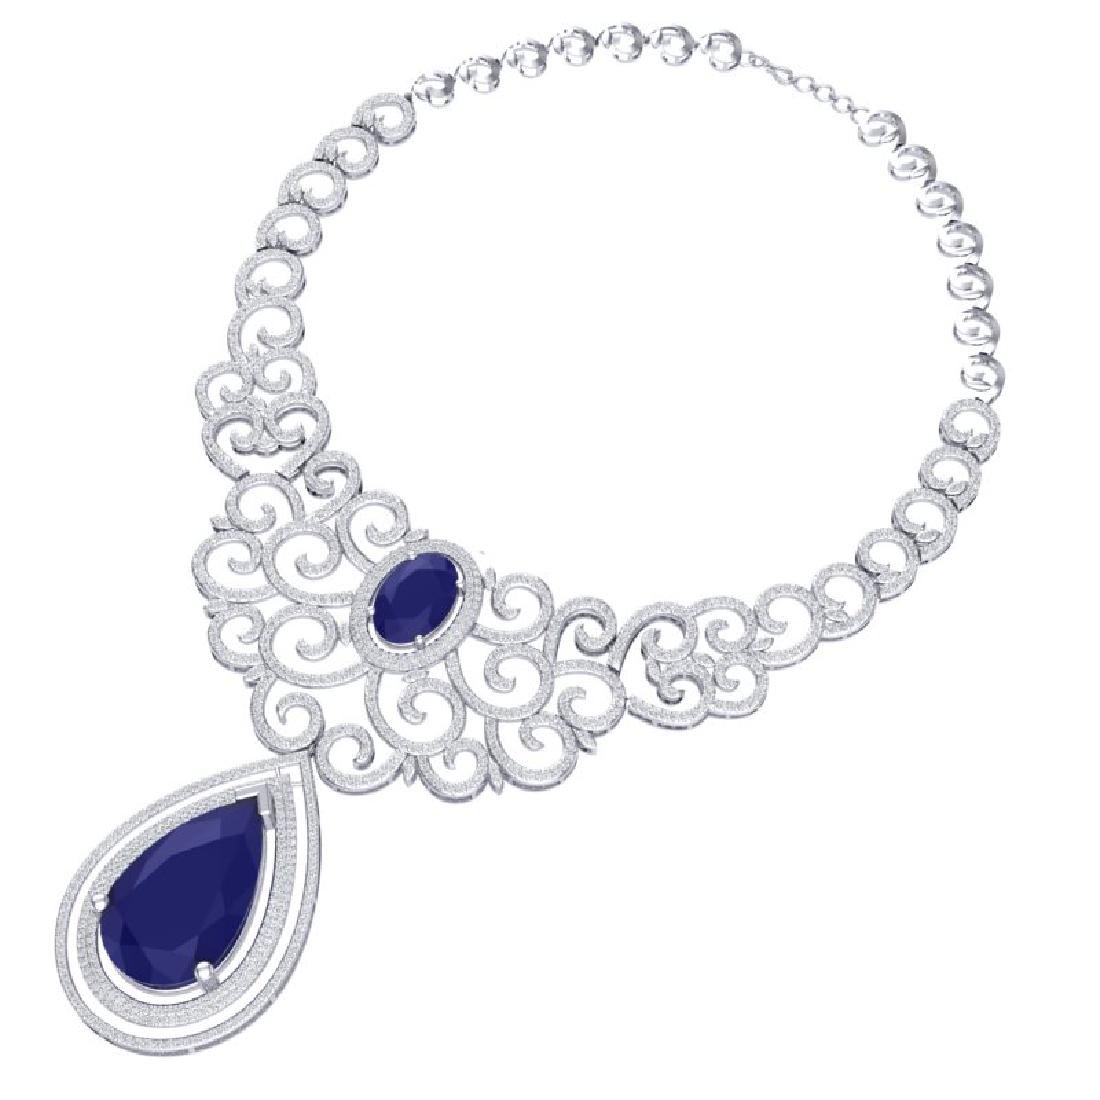 87.52 CTW Royalty Sapphire & VS Diamond Necklace 18K - 3